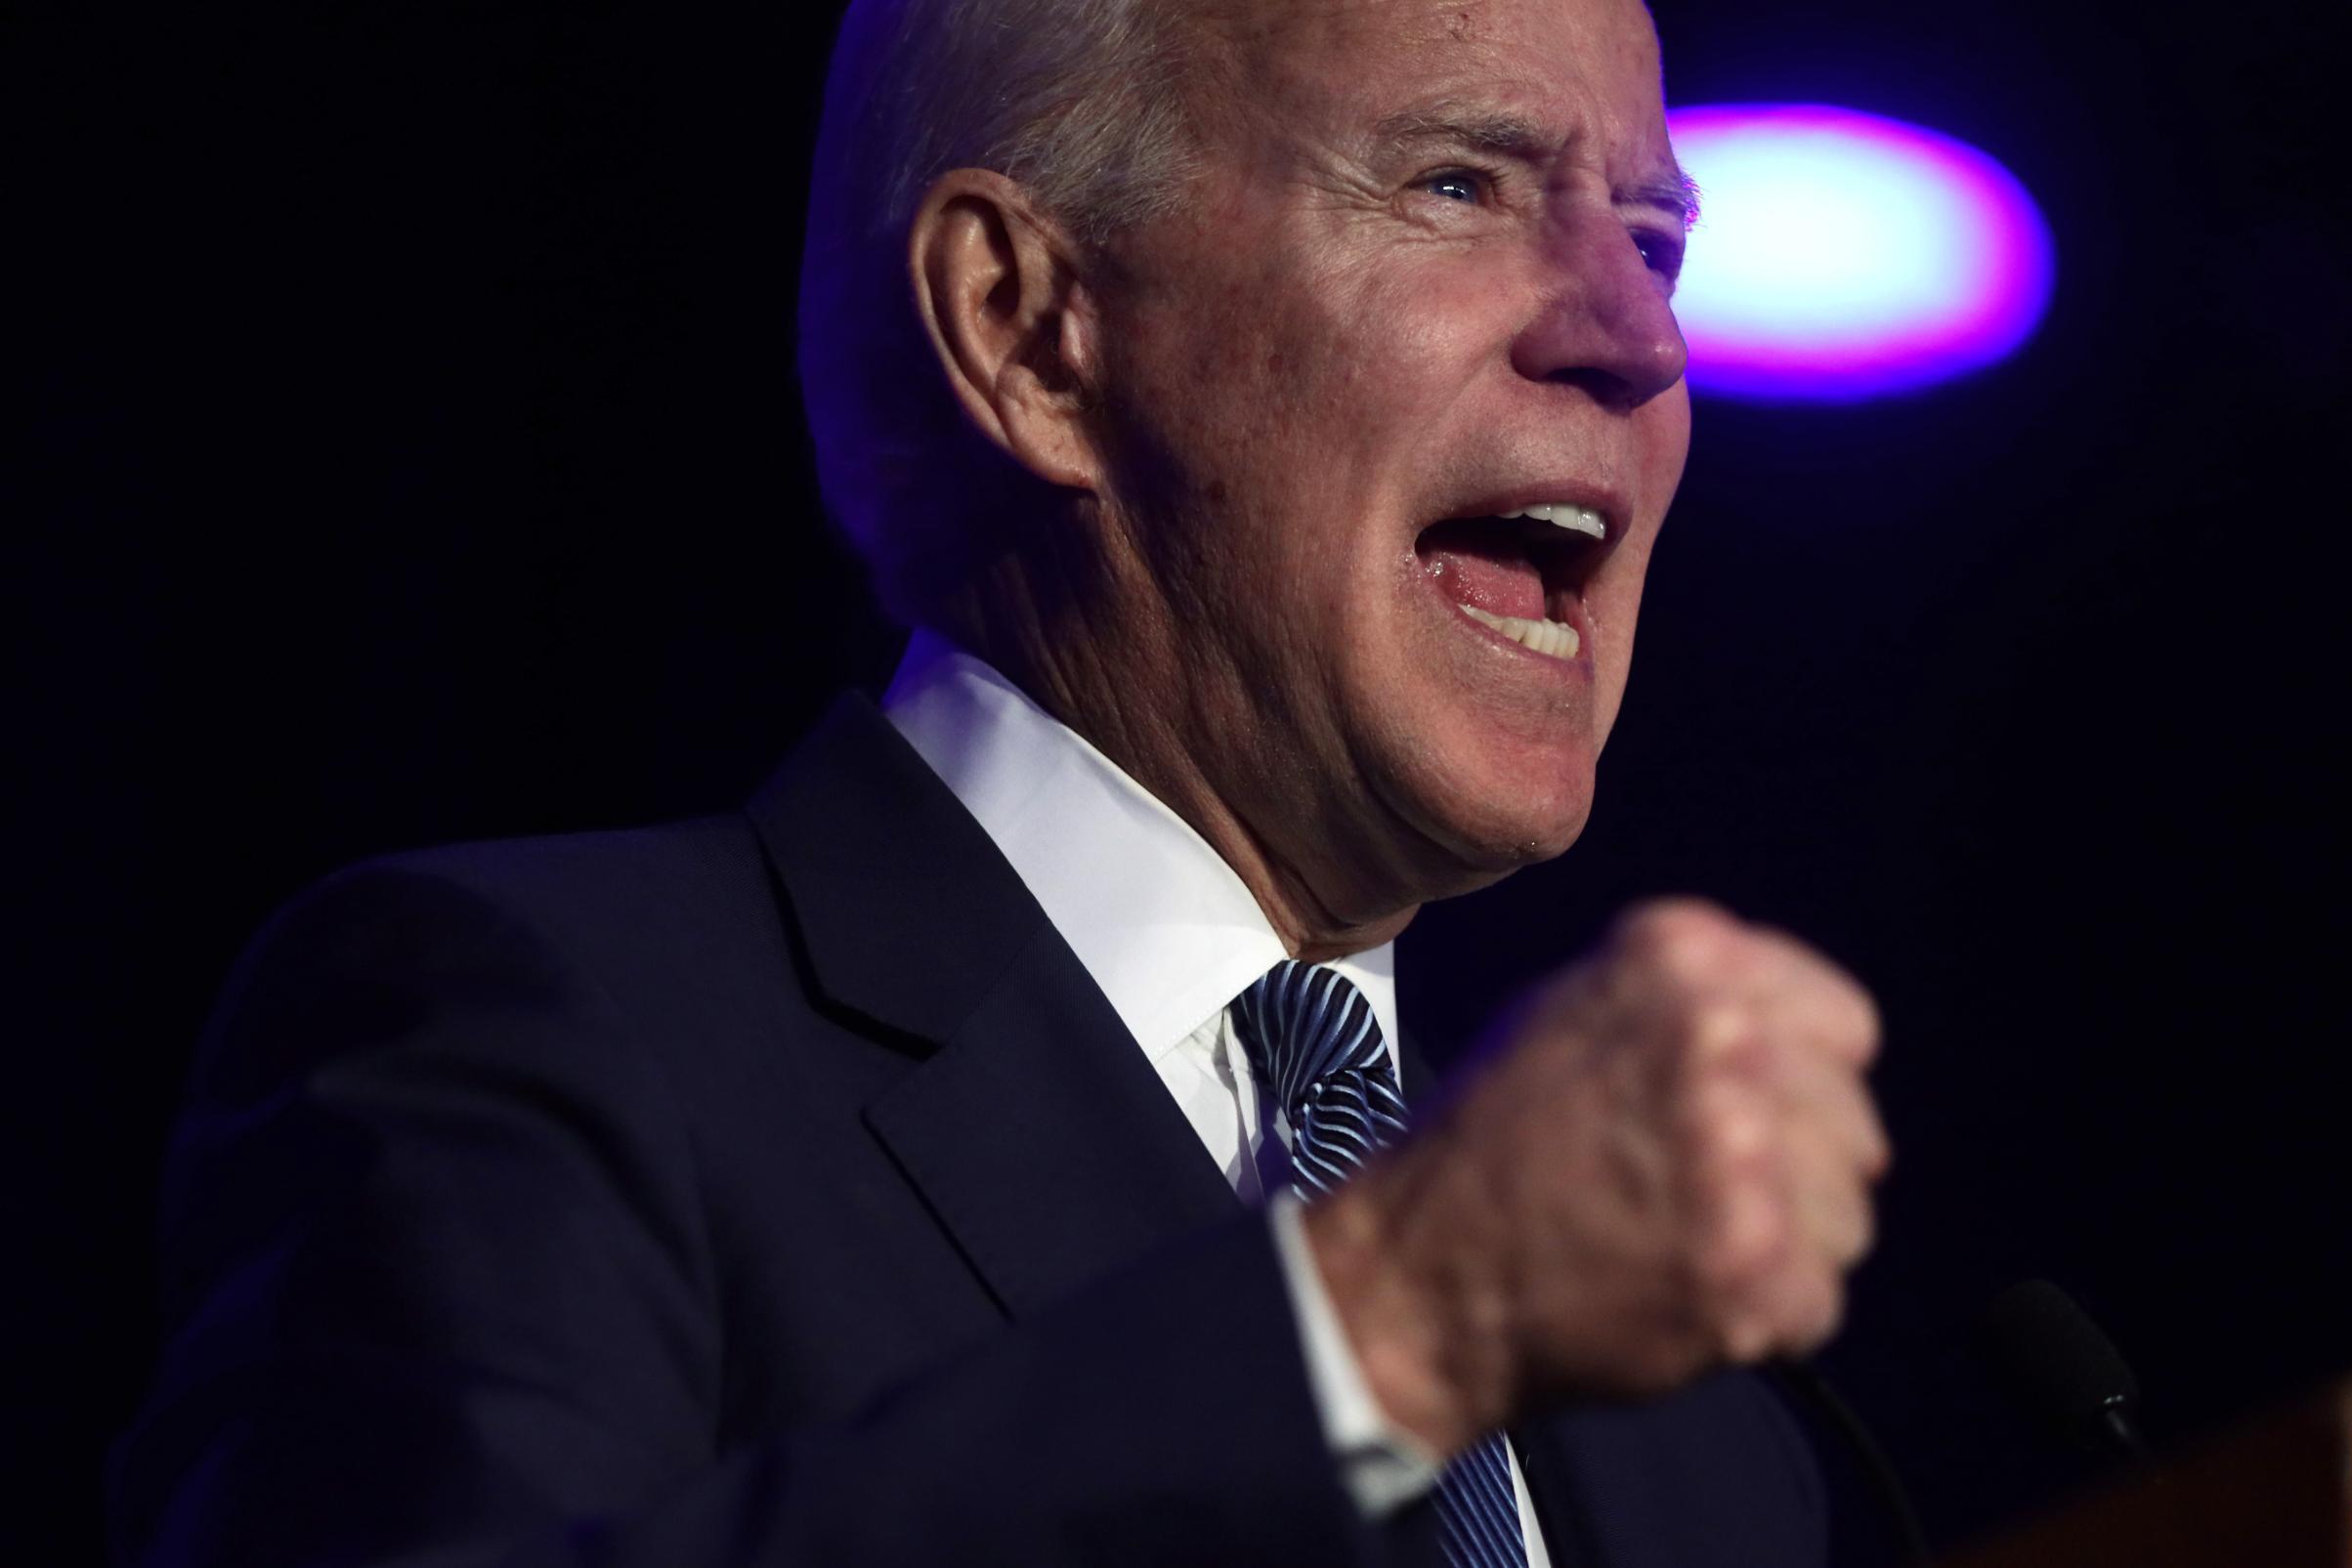 Biden slams Sanders and 'cowards' in Congress over gun violence